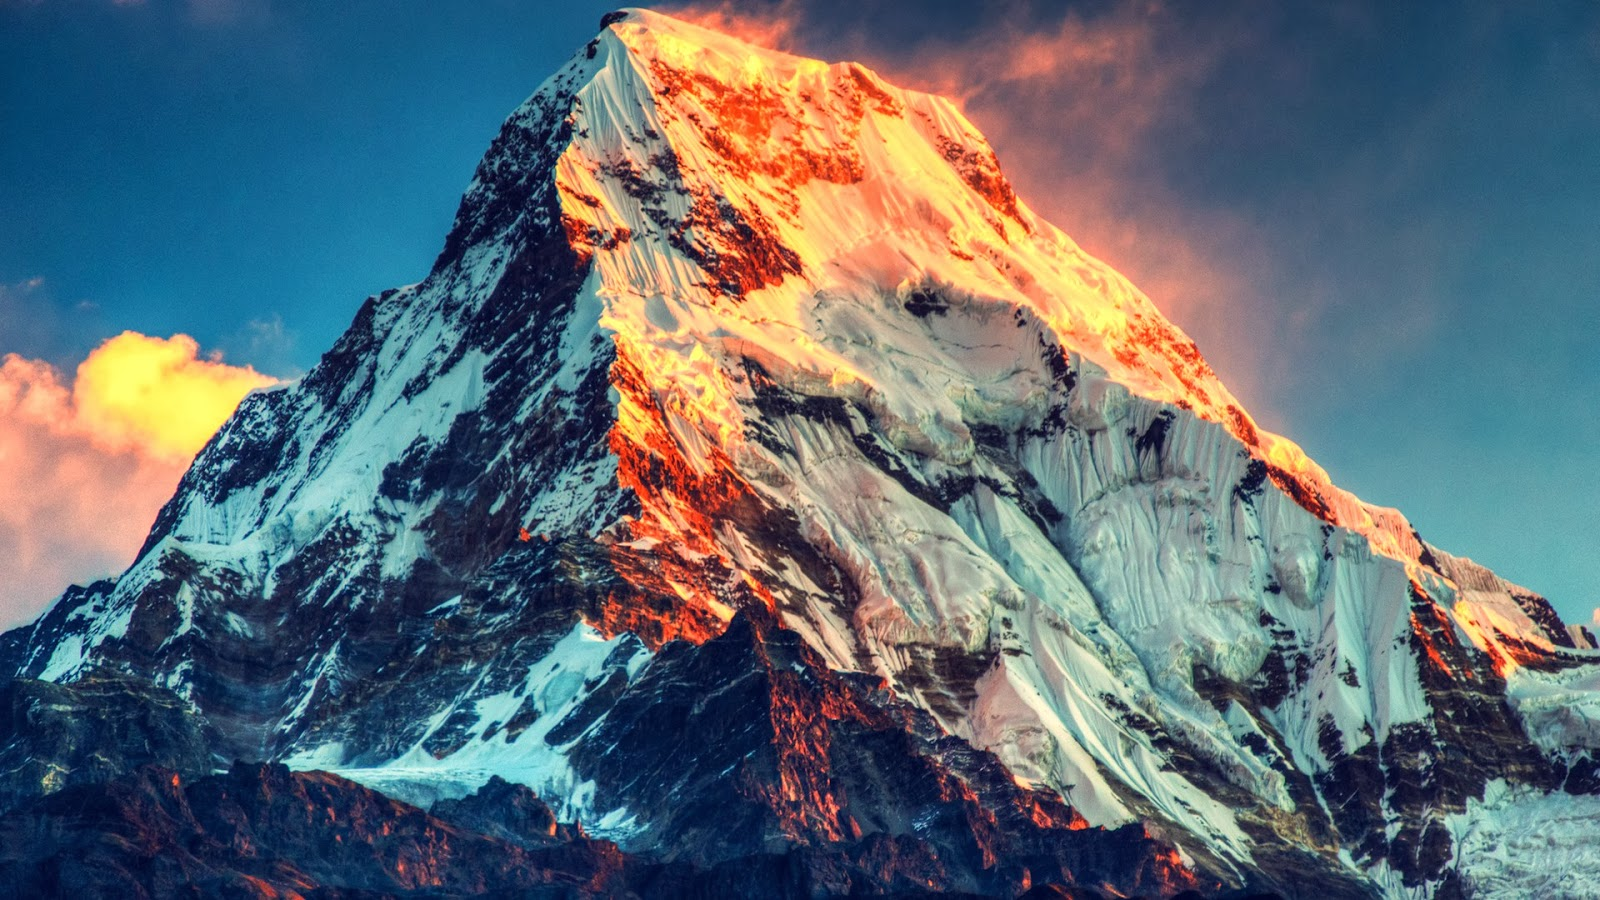 Mount Everest - 15 Highest Peaks in the World